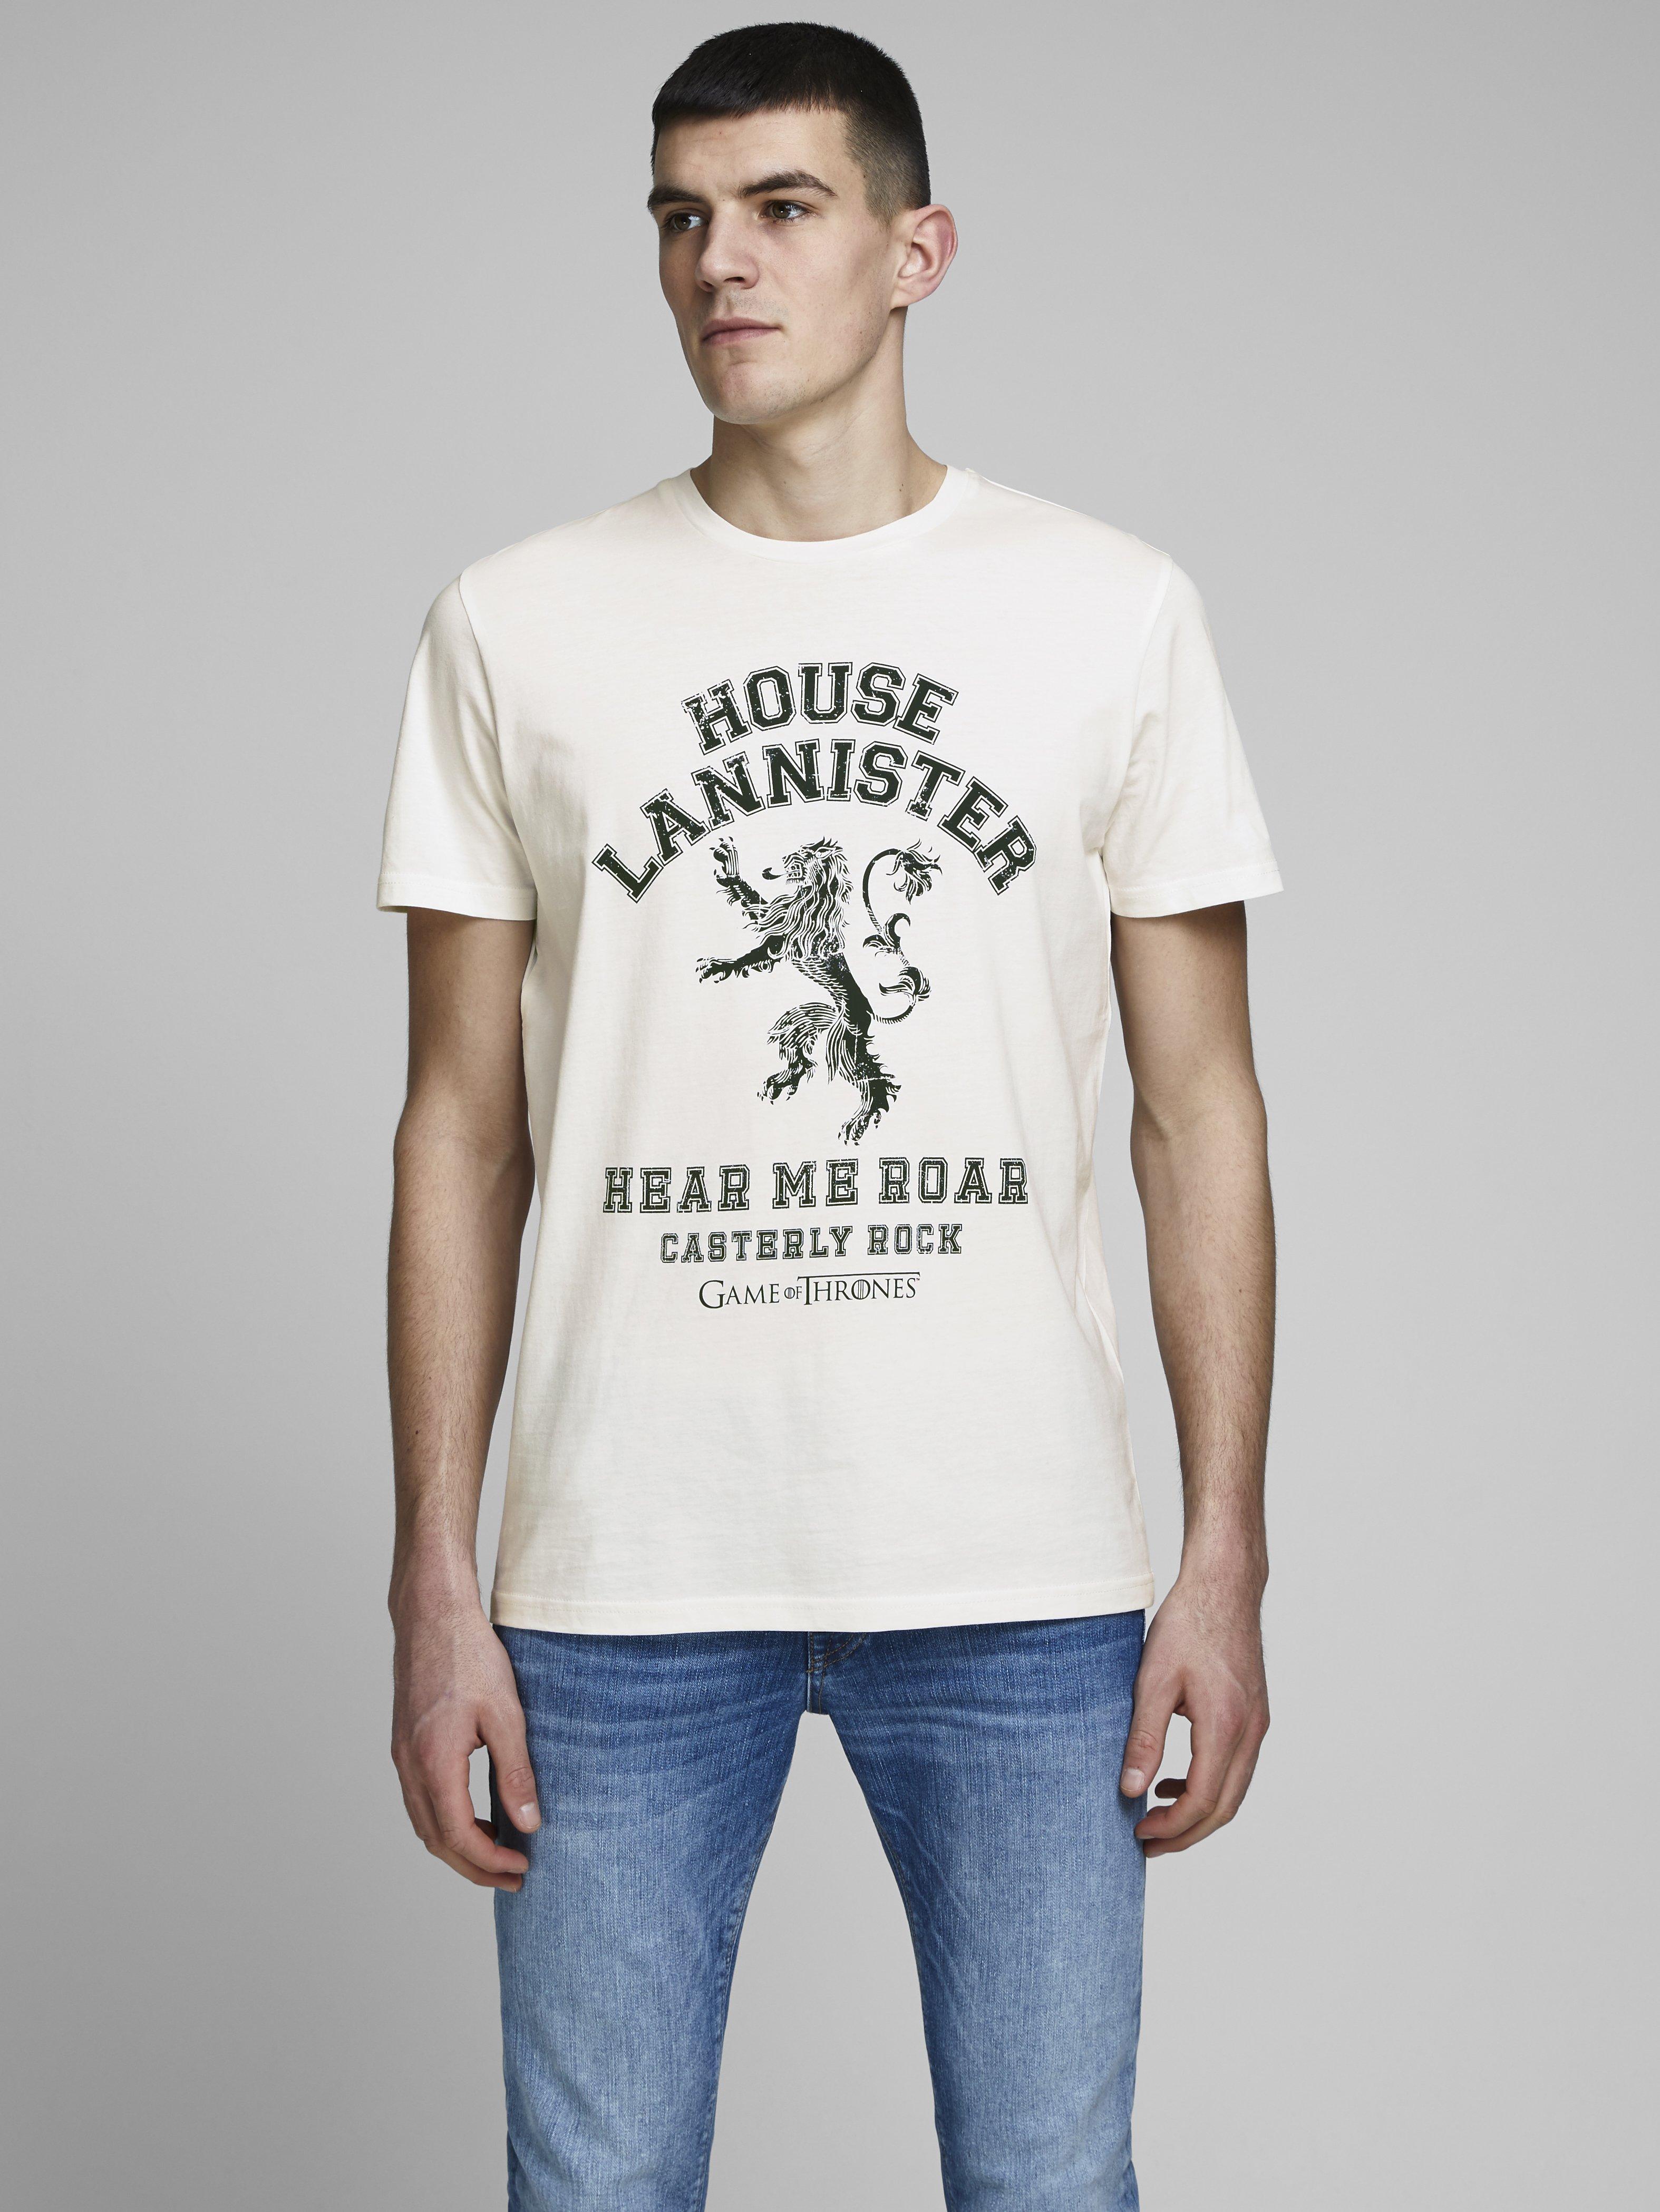 Jackamp; Of shirt Dancer ThronesT Imprimé Cloud Game Jones 3jLq54RA